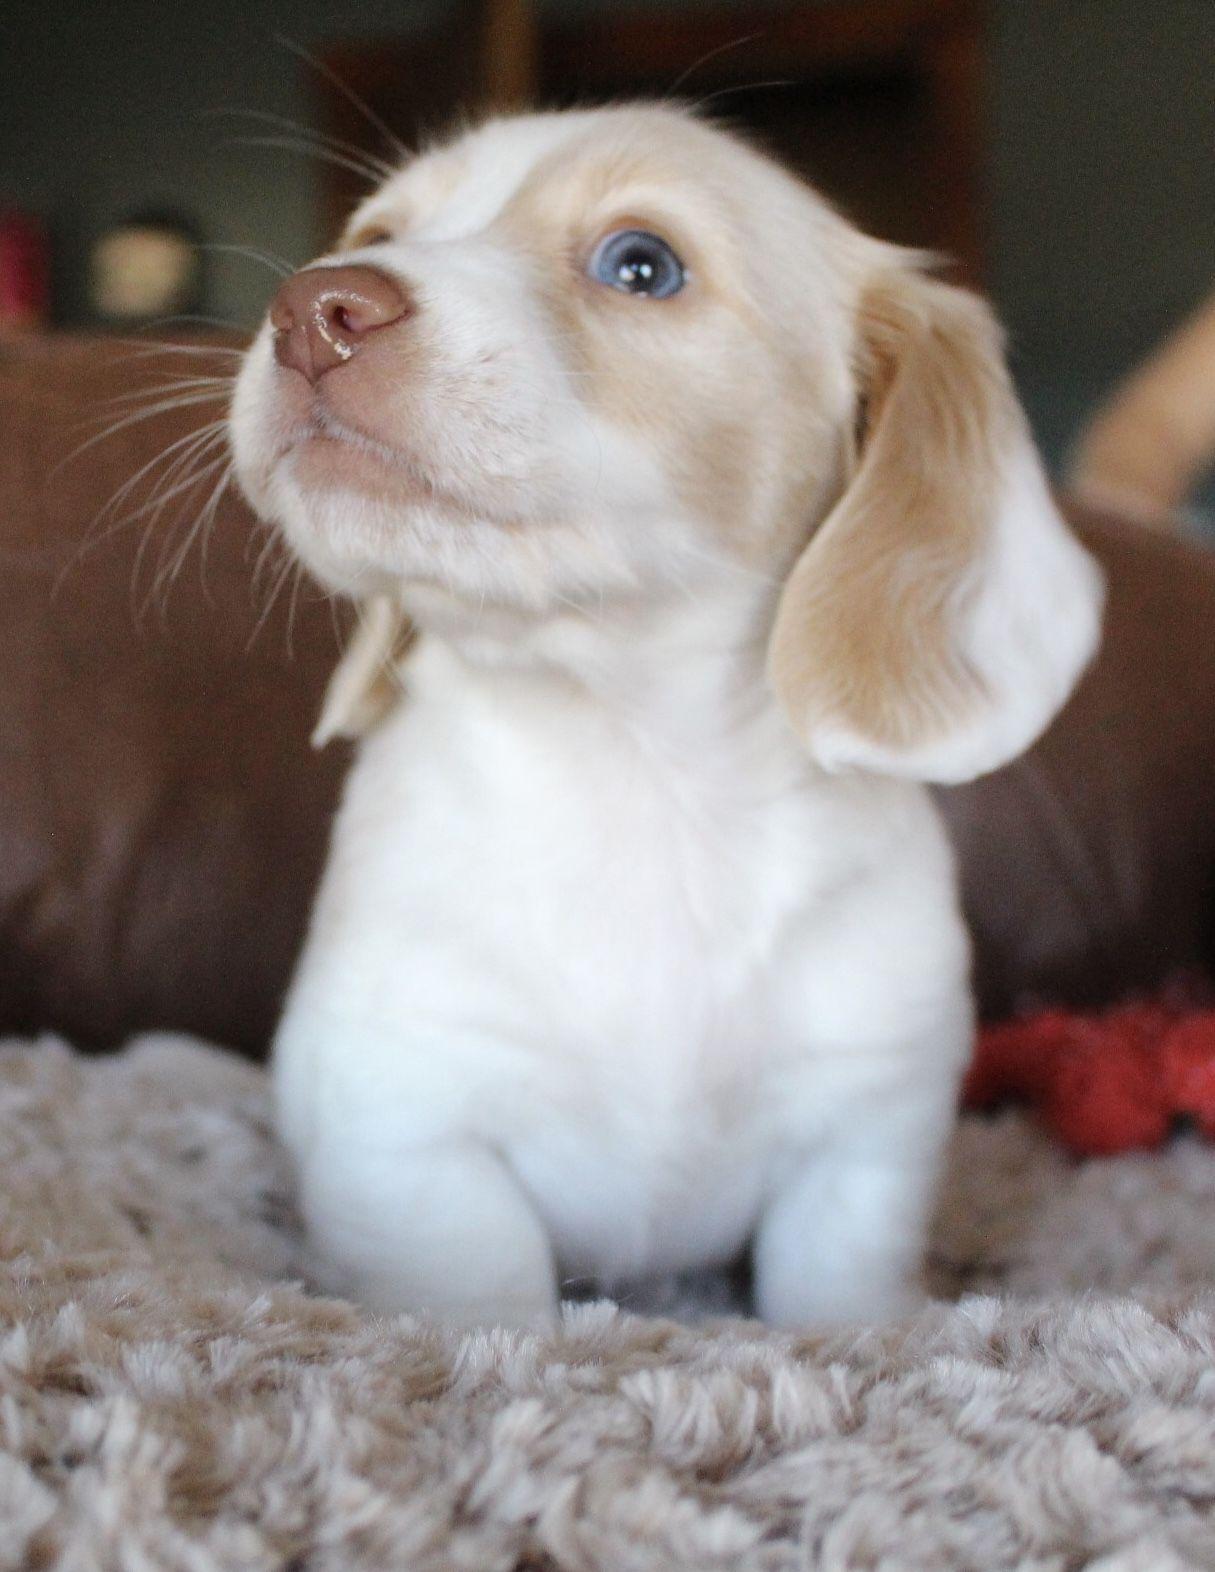 Cream Piebald Miniature Dachshund Puppy At Muddy River Dachshunds